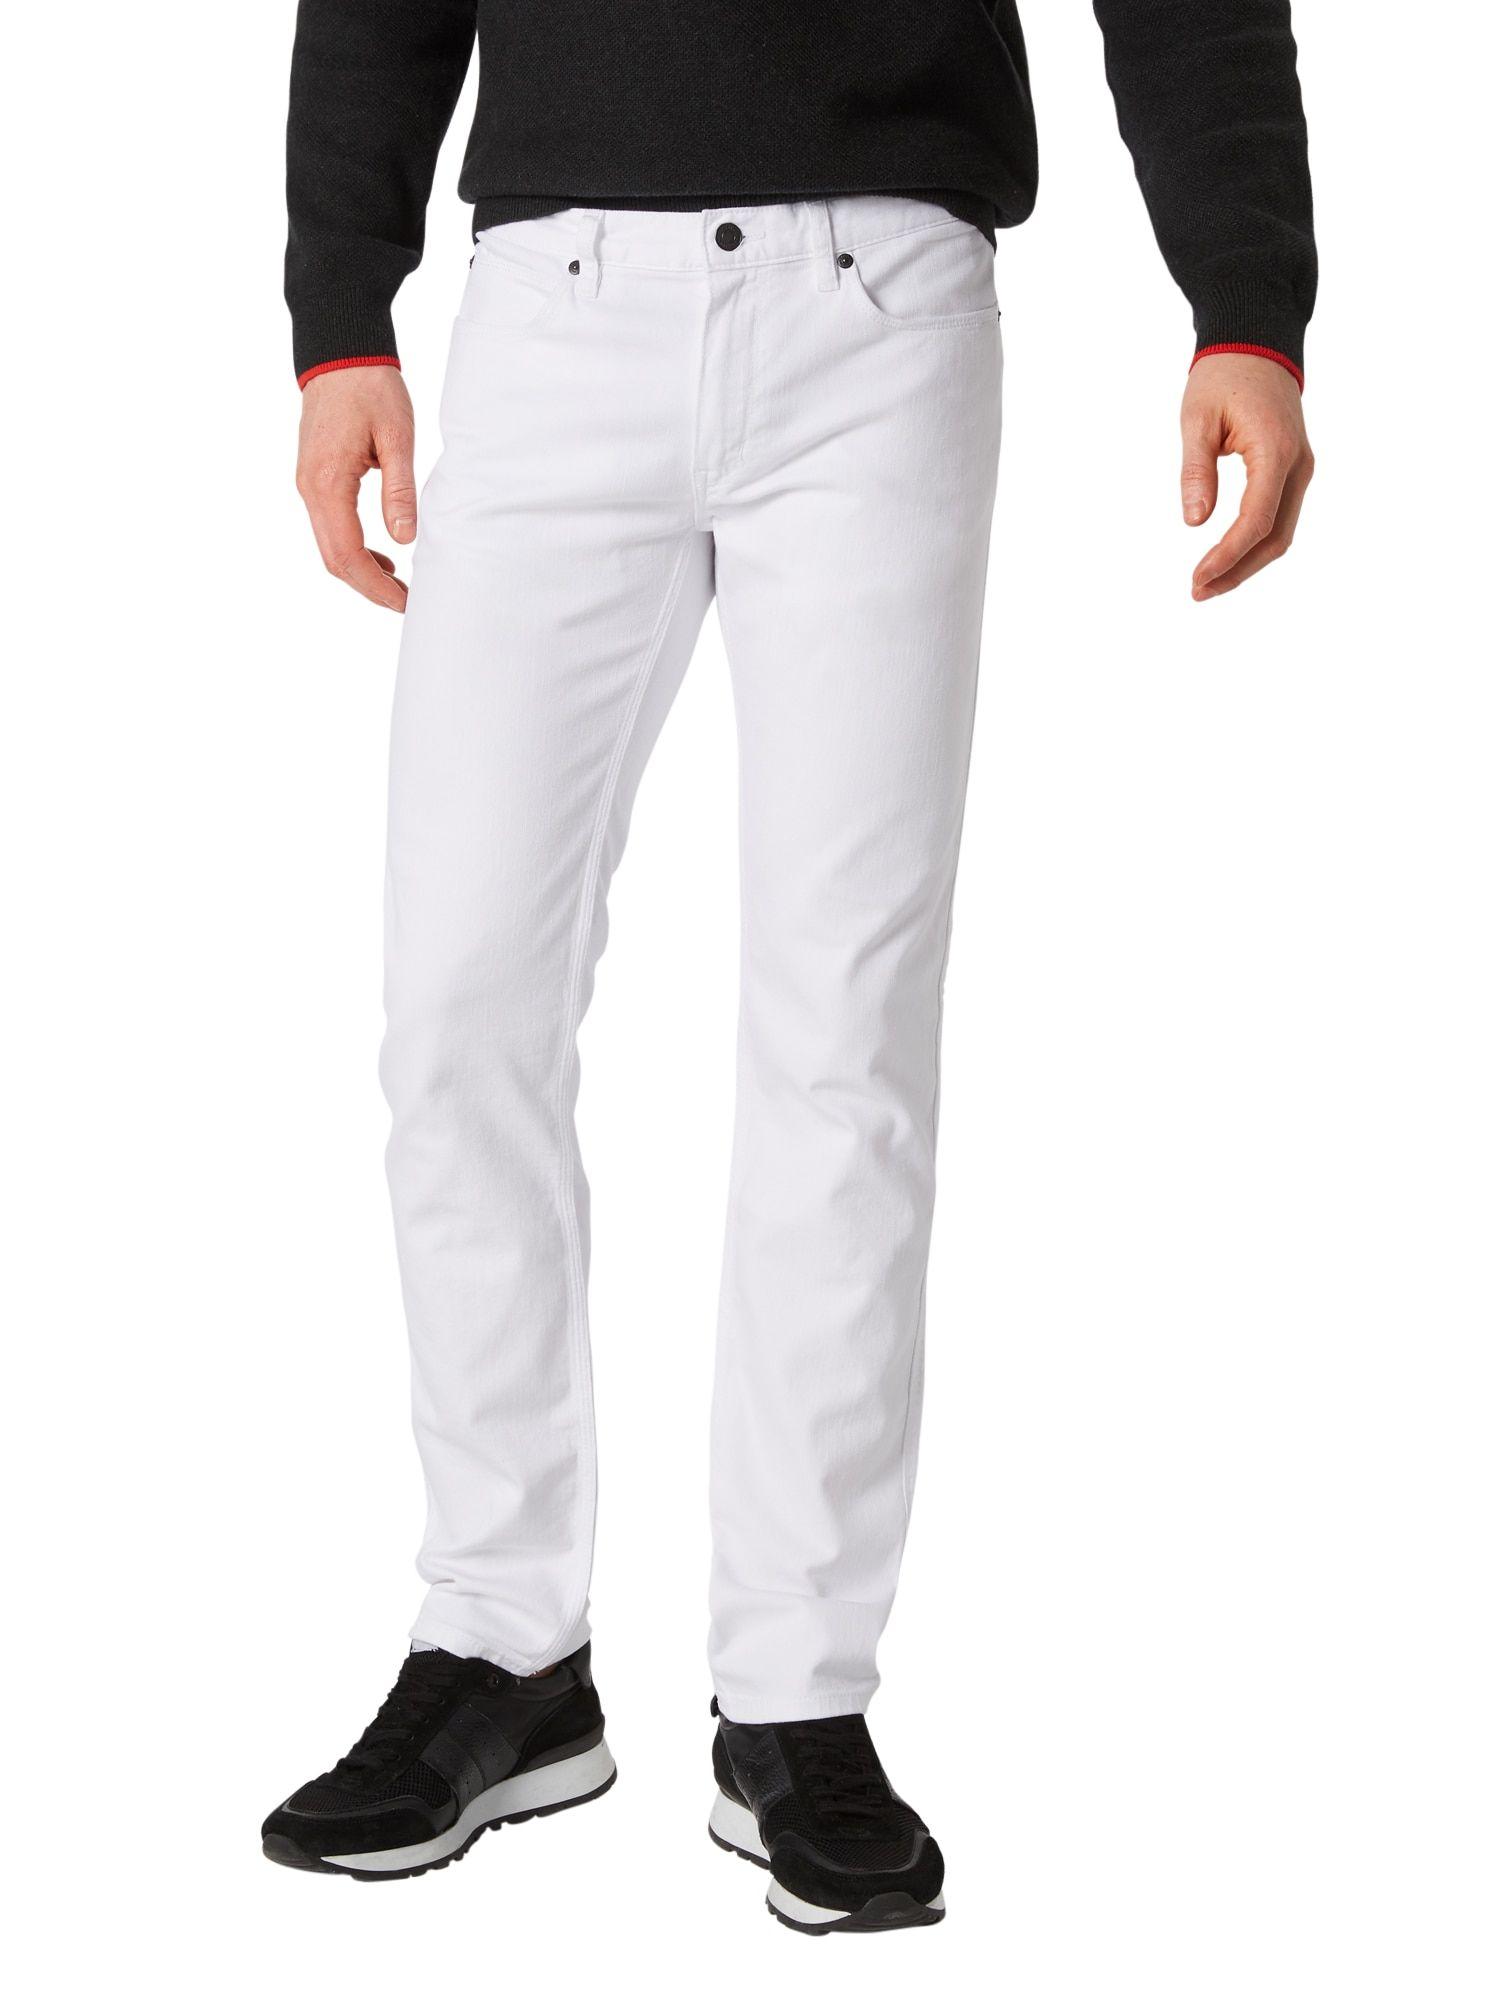 HUGO Jeans 'Hugo 708' Herren, White Denim, Größe 35 #whitepantsuit